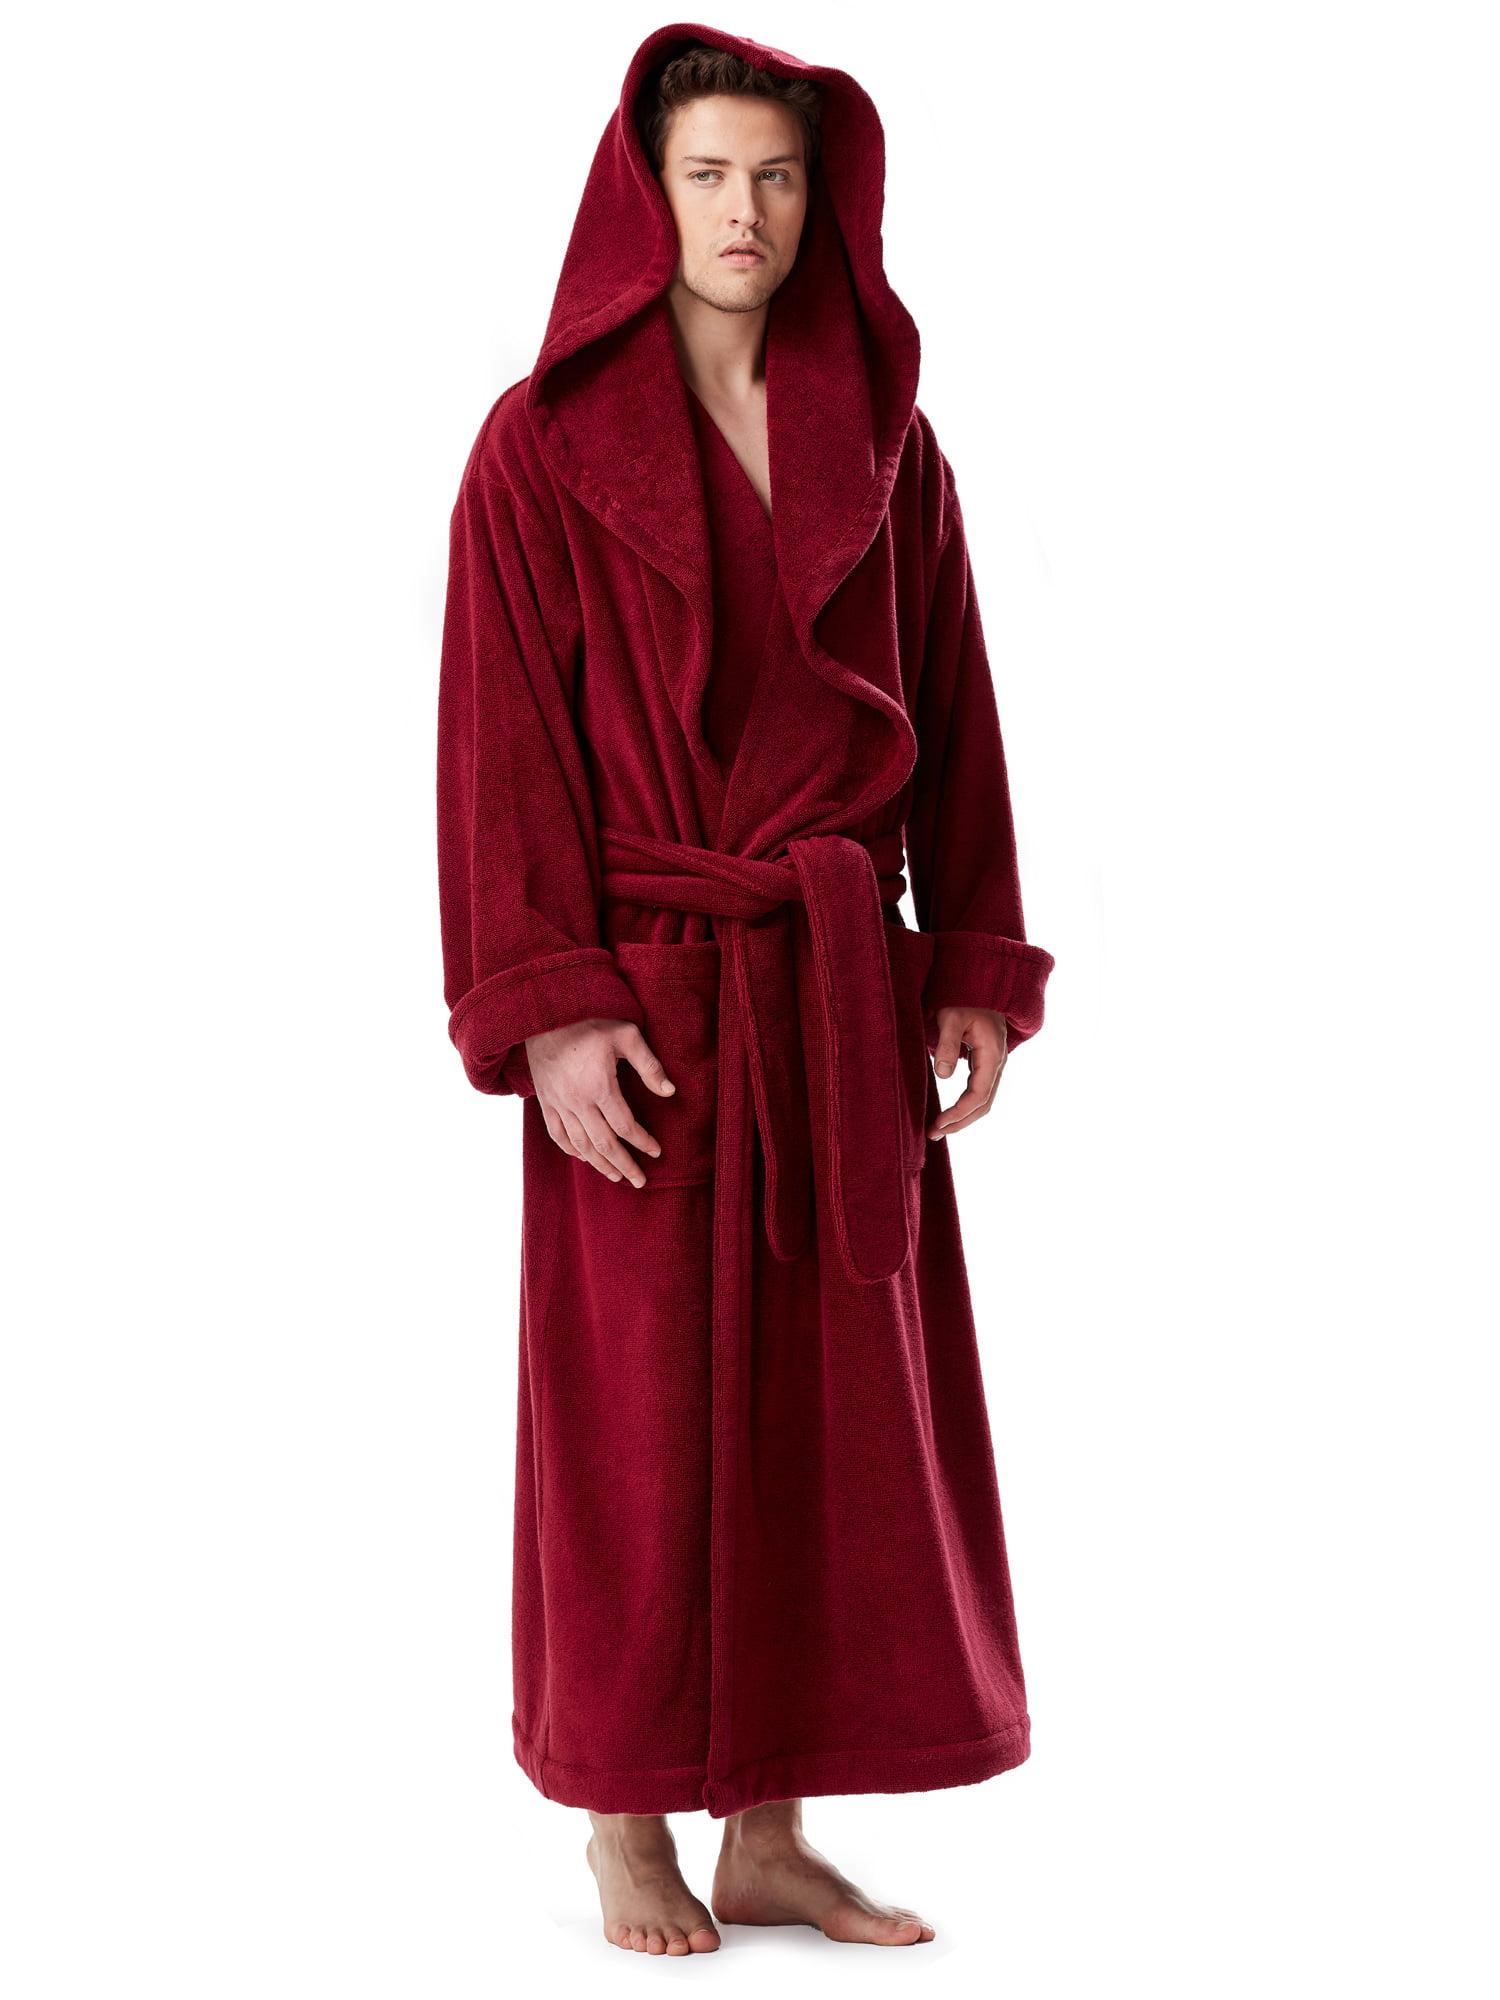 674a4c68f9 Arus - Men s Luxury Medieval Monk Robe Style Full Length Hooded Turkish Terry  Cloth Bathrobe - Walmart.com